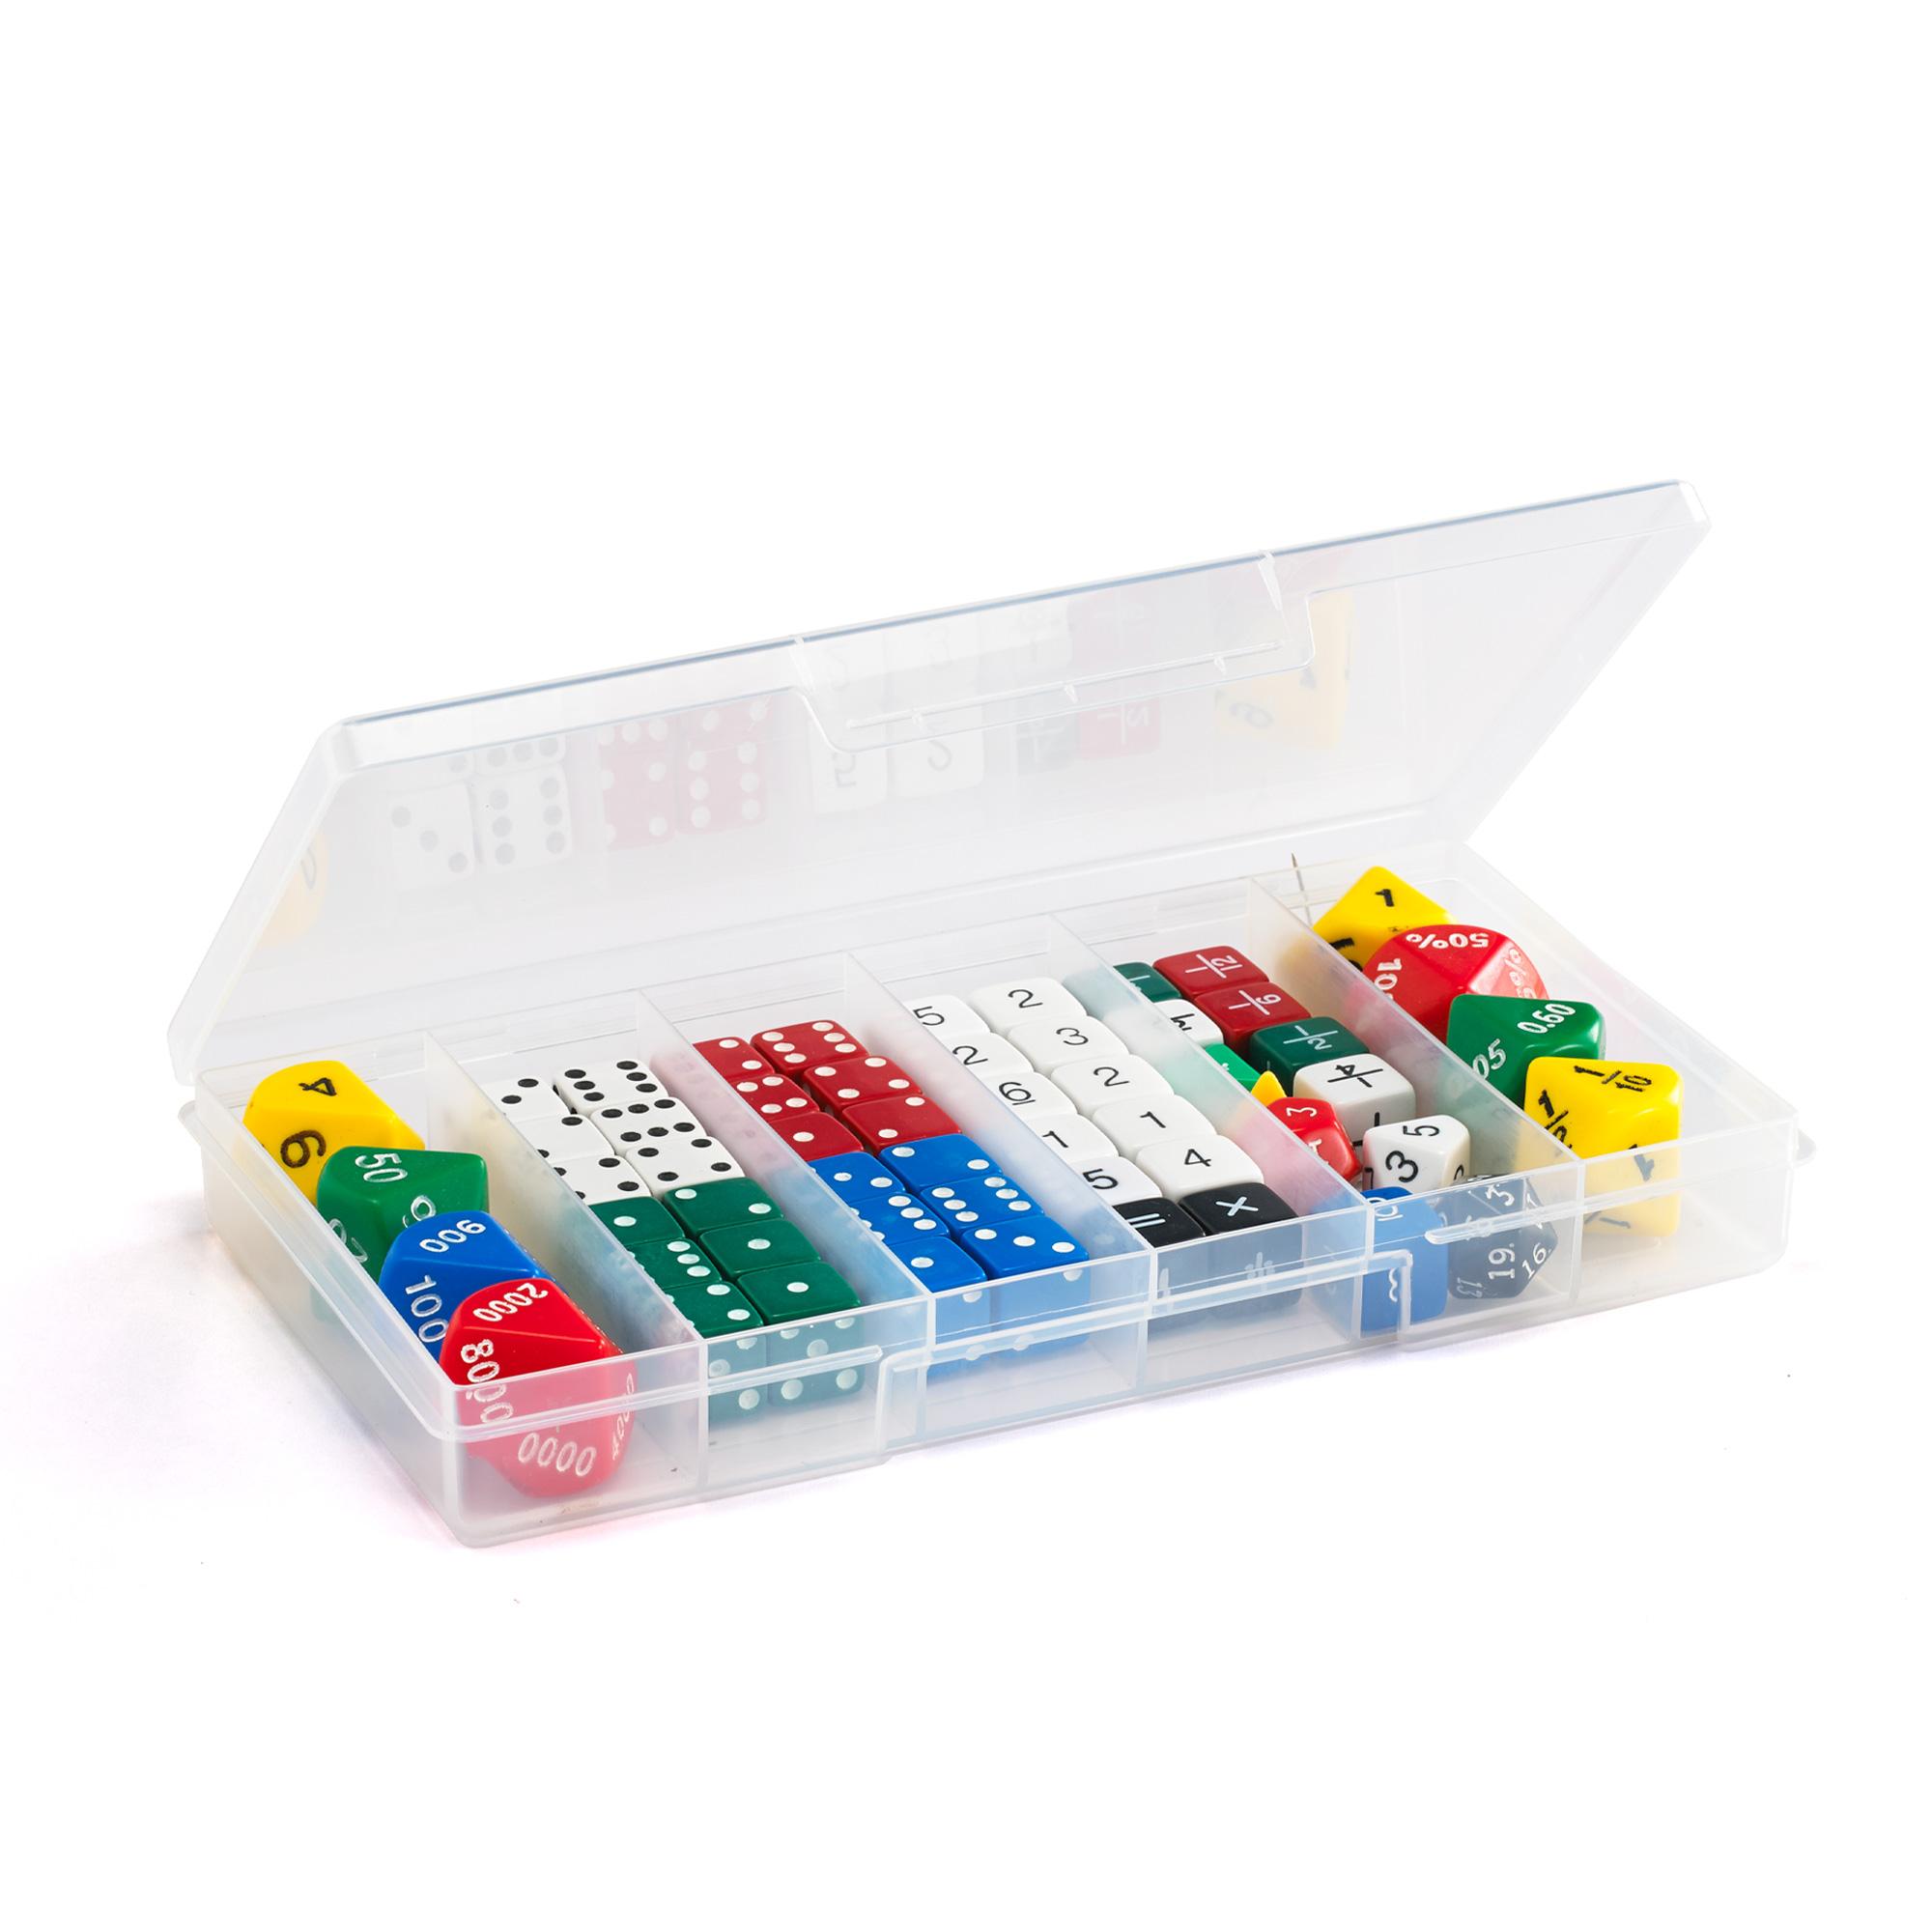 edx-education_16076C_Classroom-Dice-Set-1